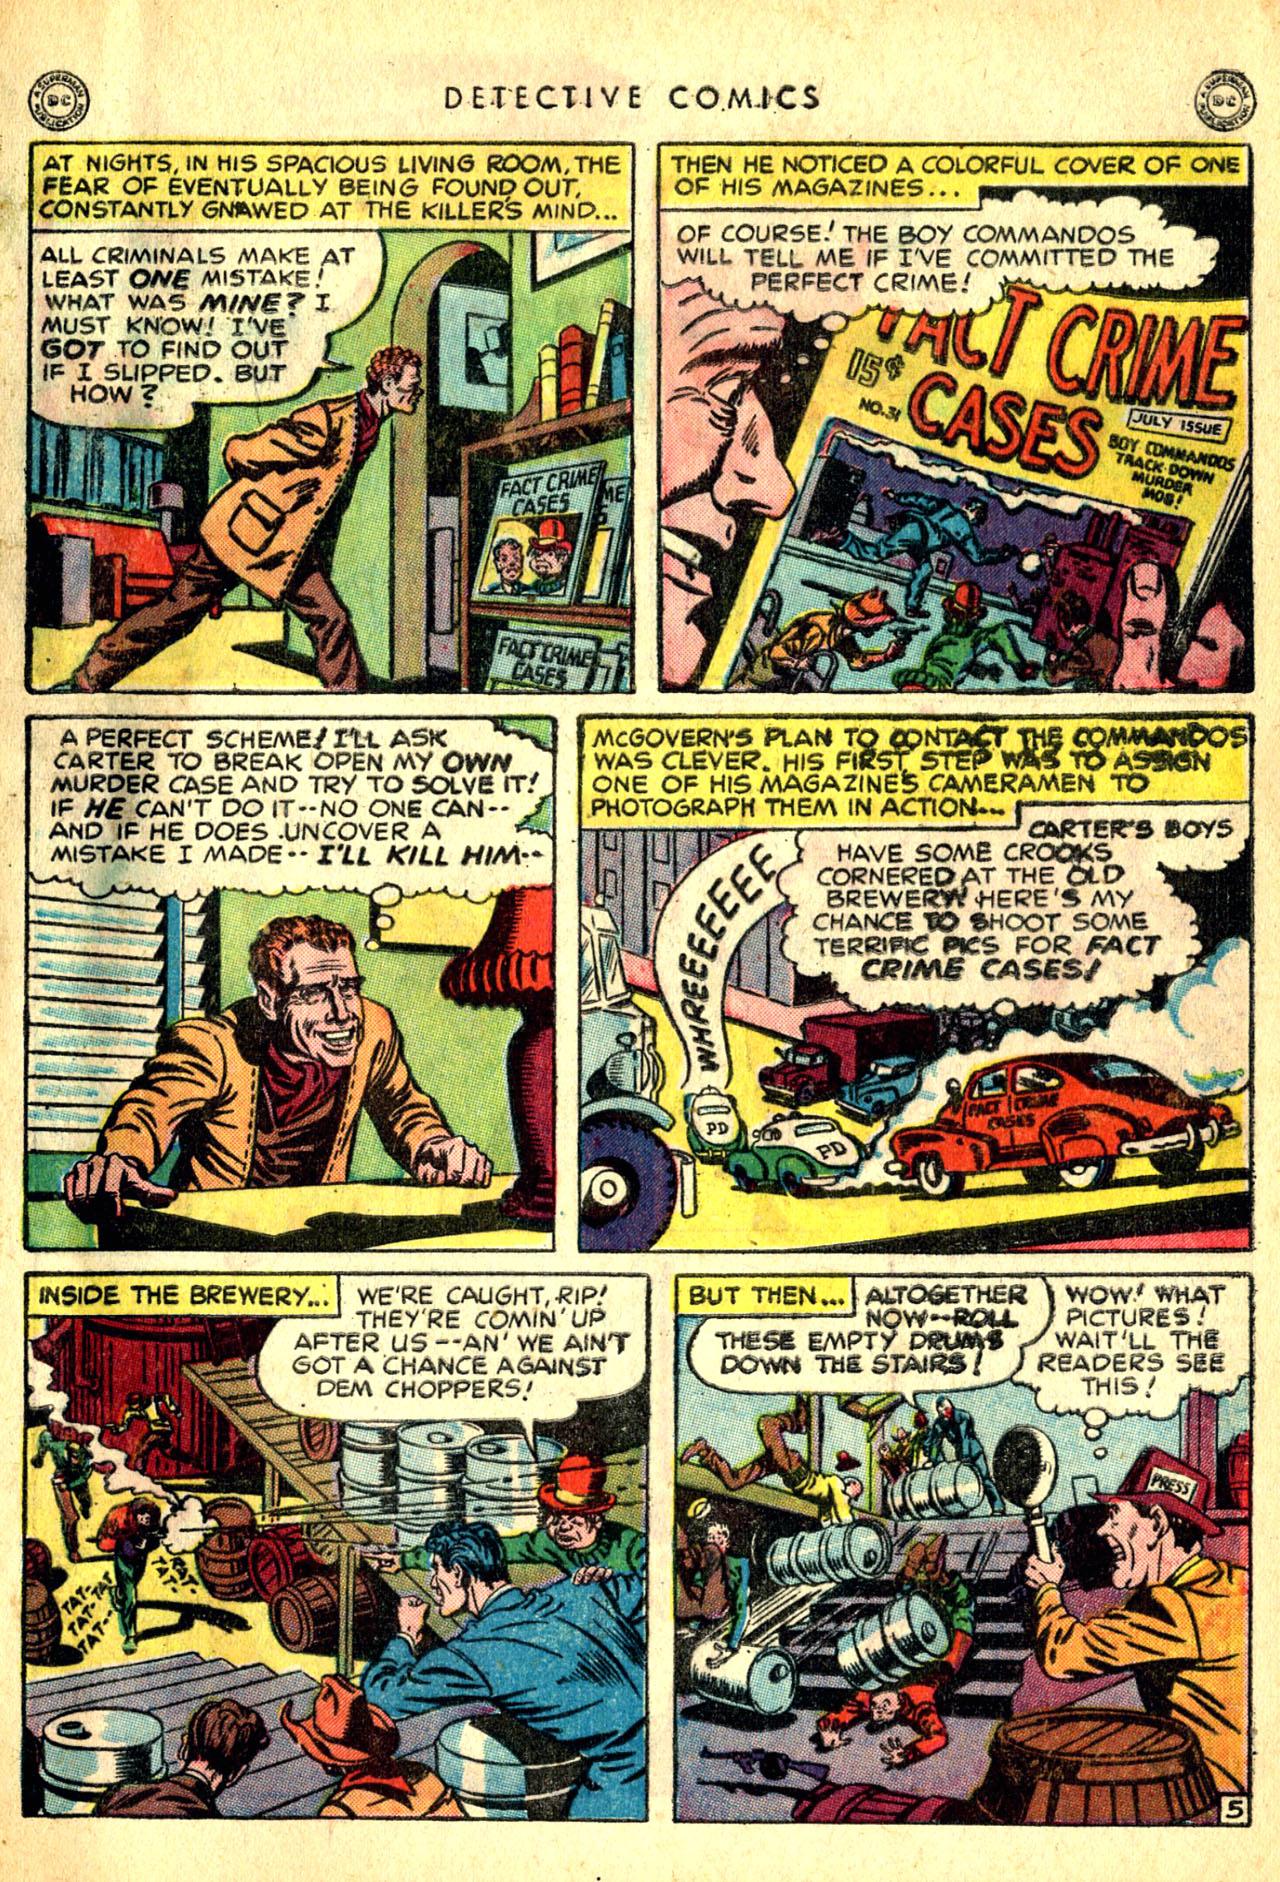 Detective Comics (1937) 141 Page 40